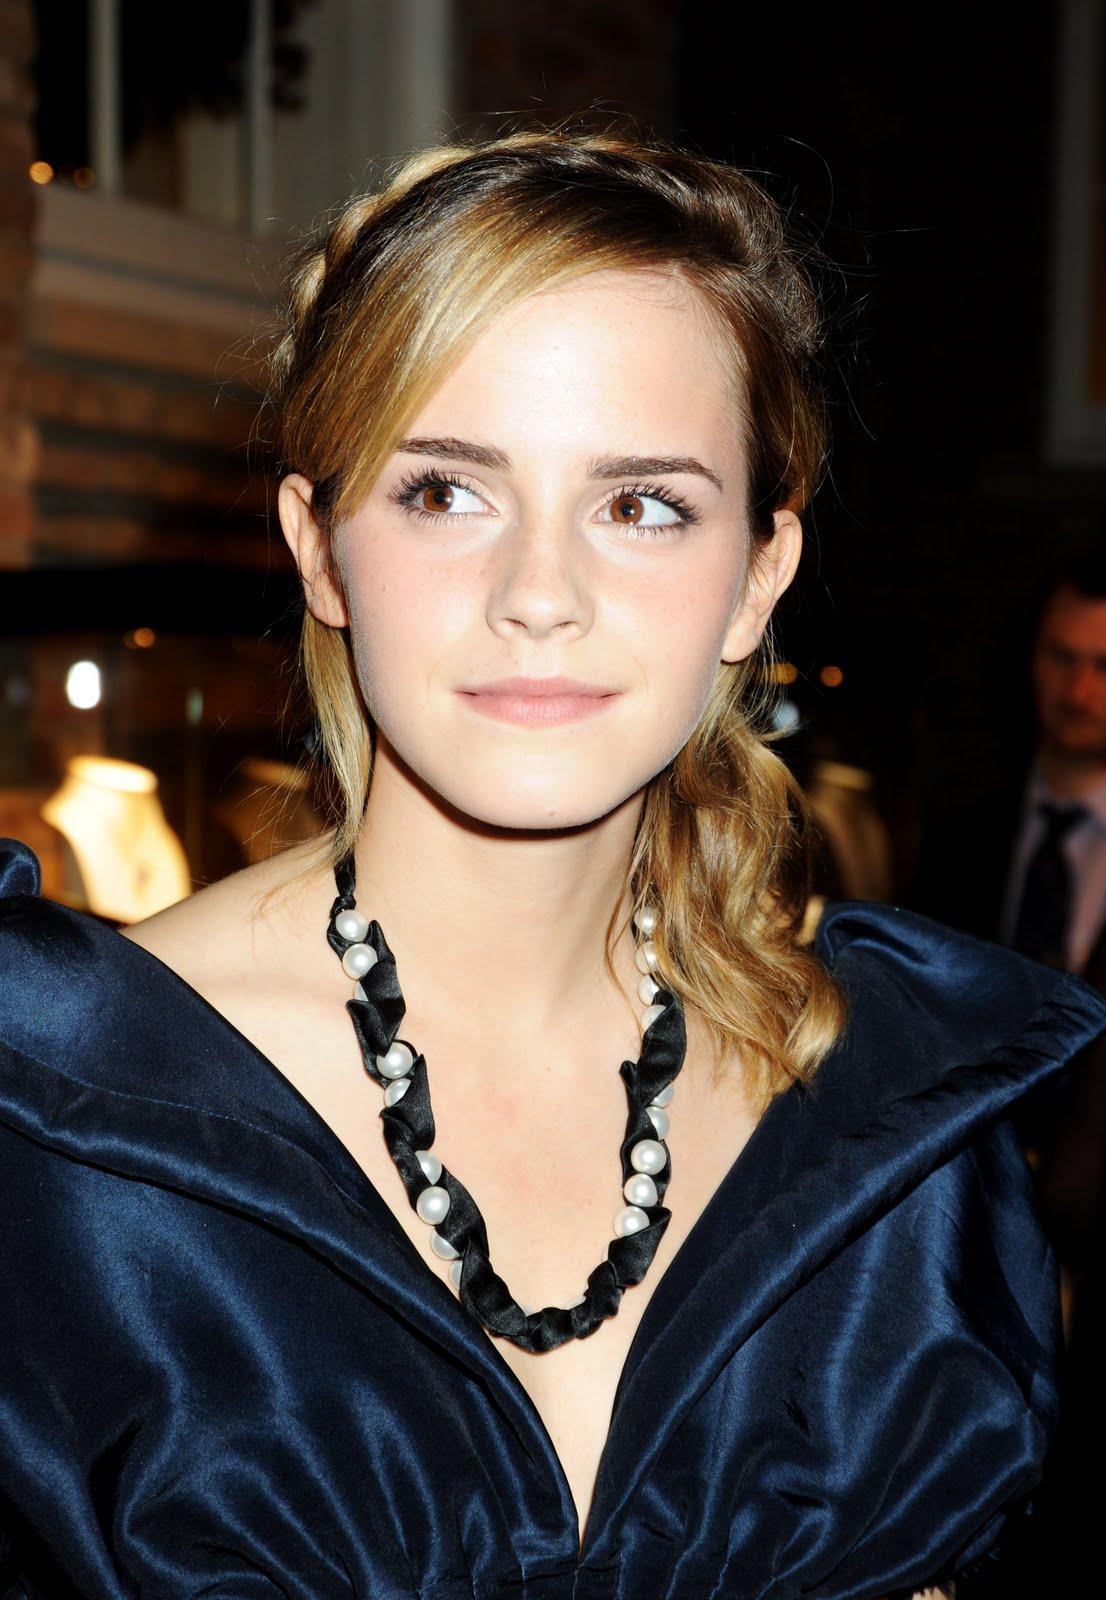 http://3.bp.blogspot.com/-KydXy4fKbhQ/TbZ4hcBp38I/AAAAAAAABic/y2JjzaUbF8E/s1600/Emma+Watson+2.jpg